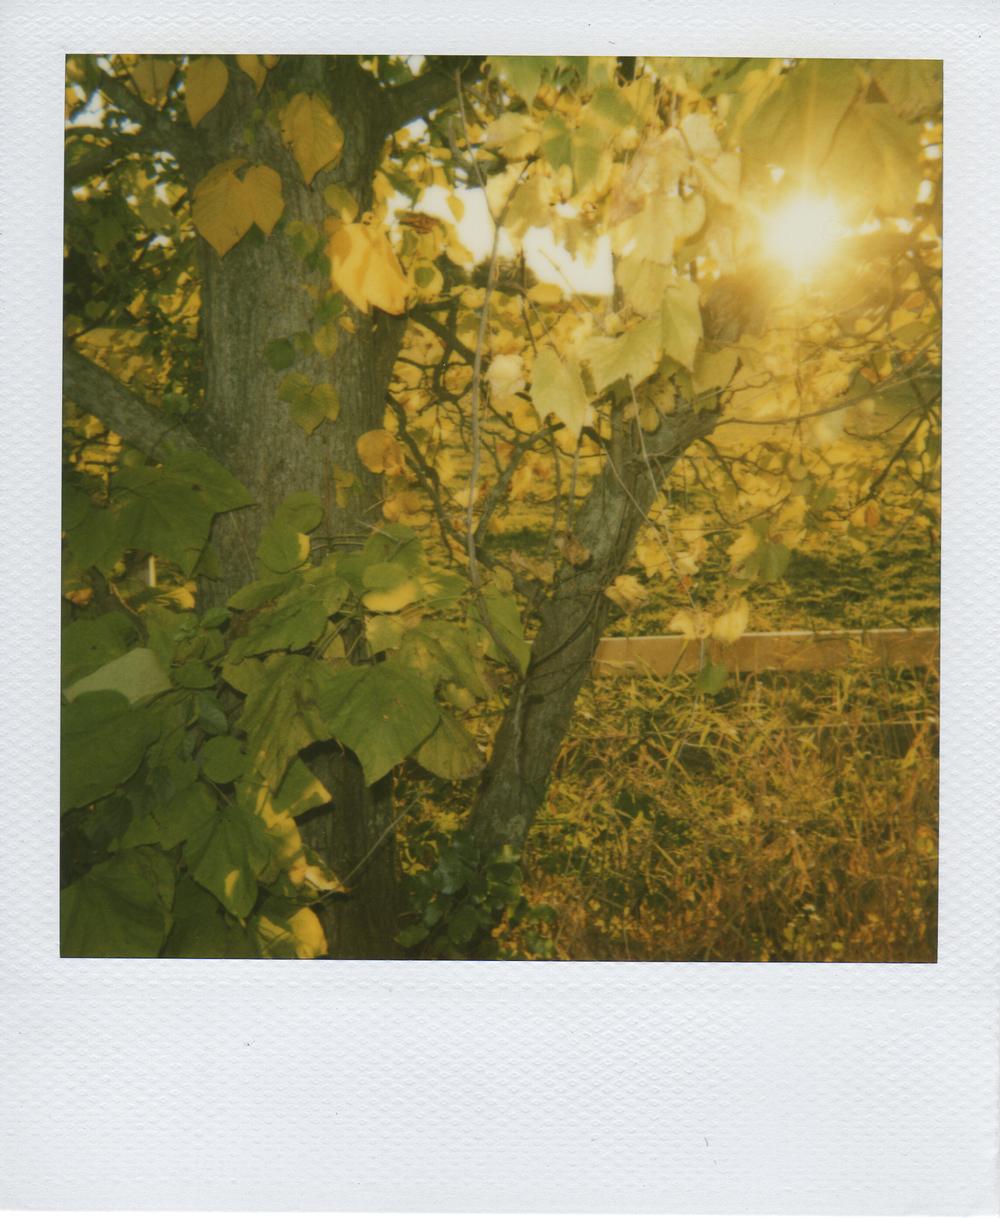 jlaurence-polaroid-095.jpg